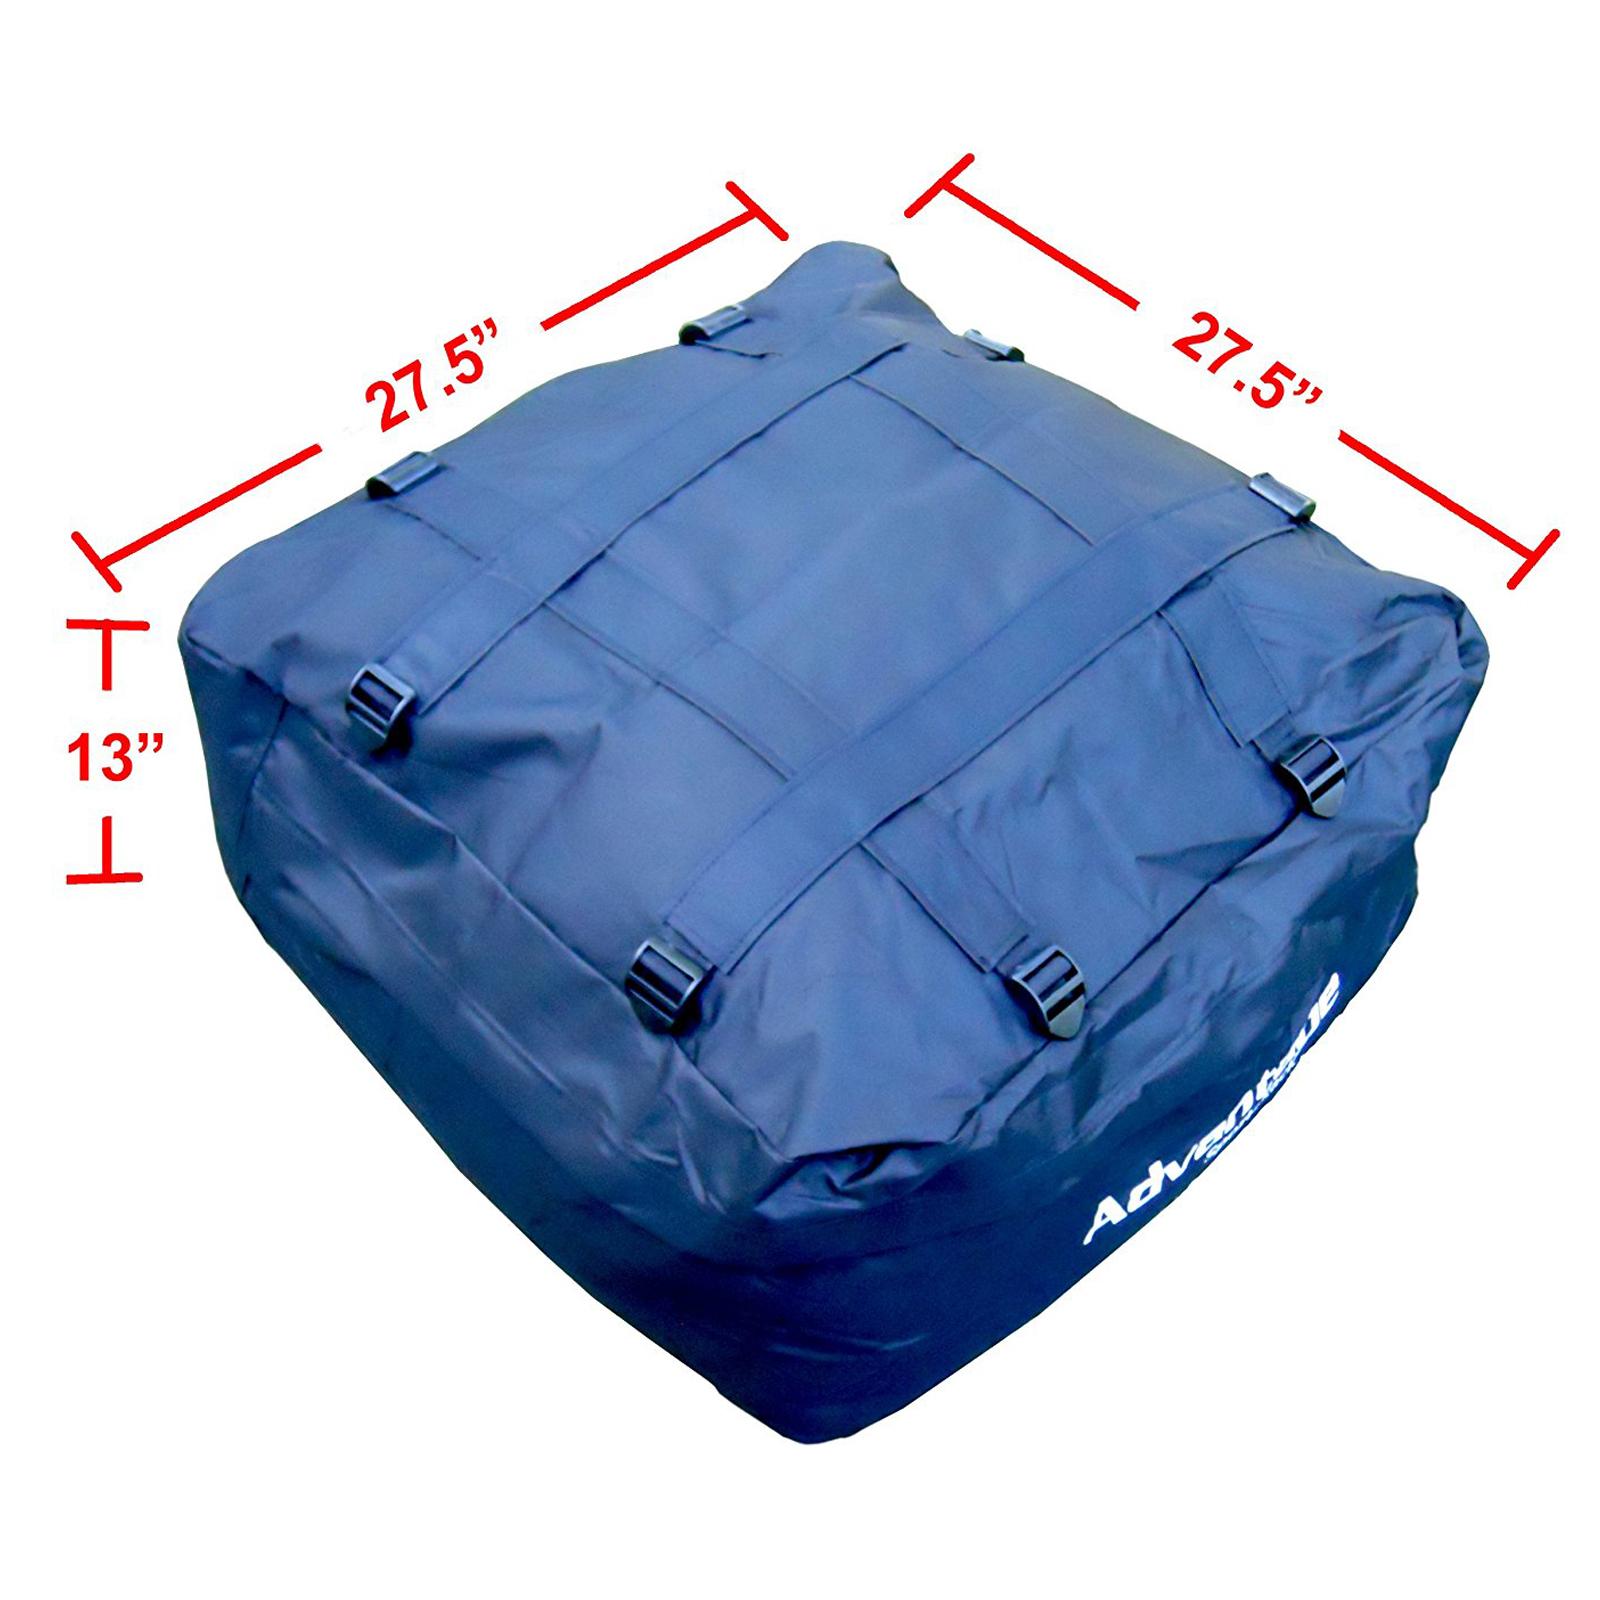 Advantage SportsRack SofTop Weather Resistant Roof Cargo Bag 6 Cubic Feet